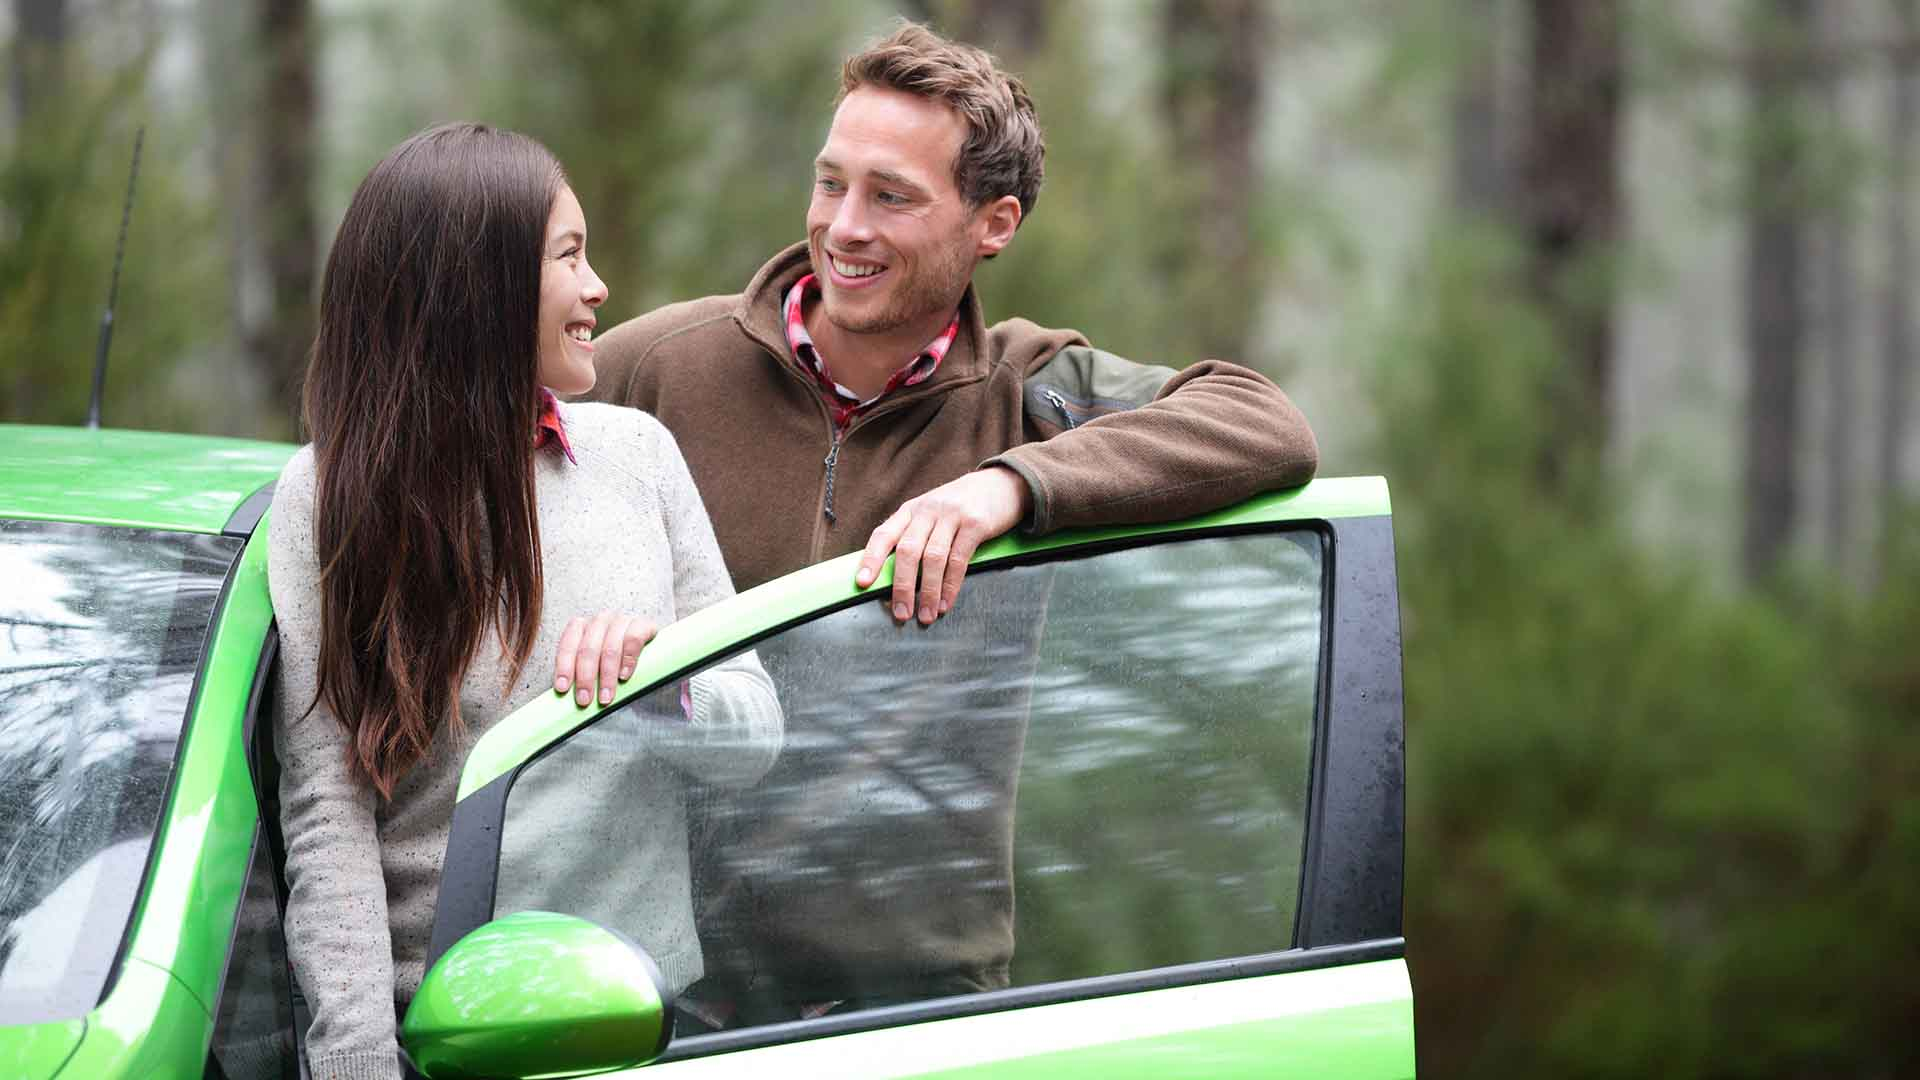 LV car insurance refunds